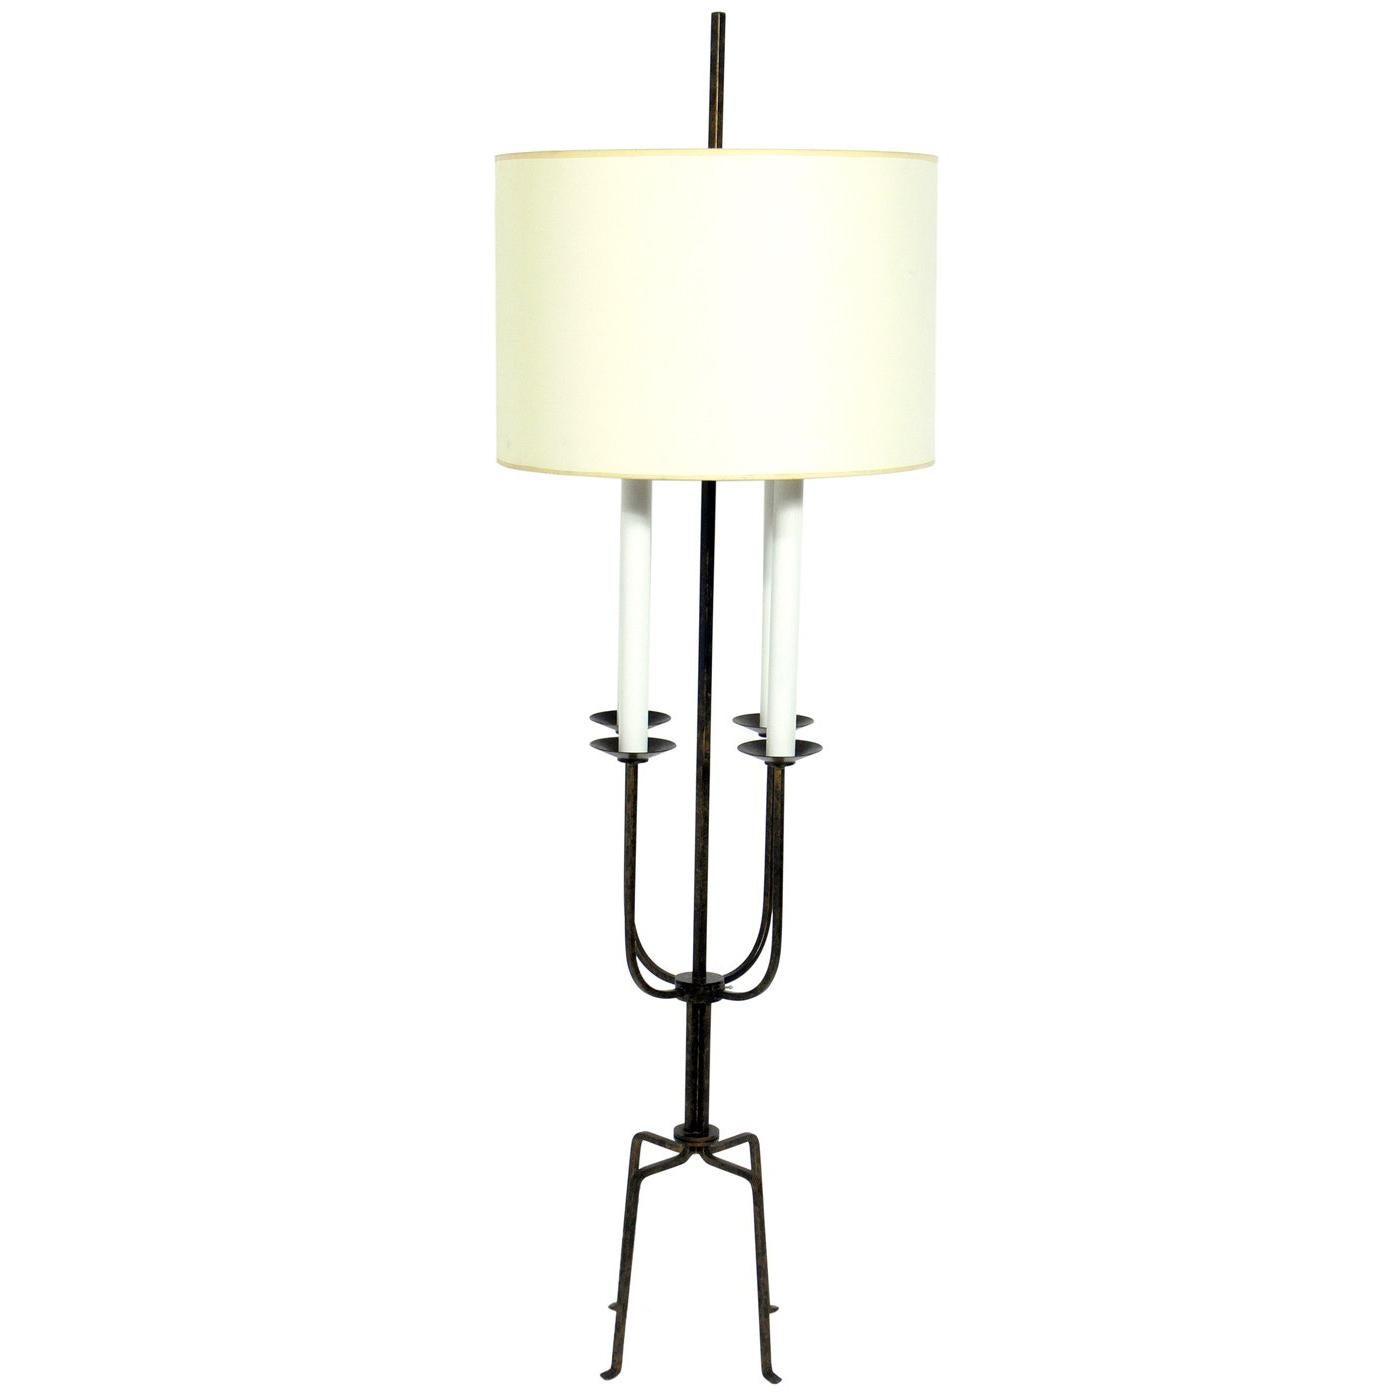 Tommi Parzinger Floor Lamp